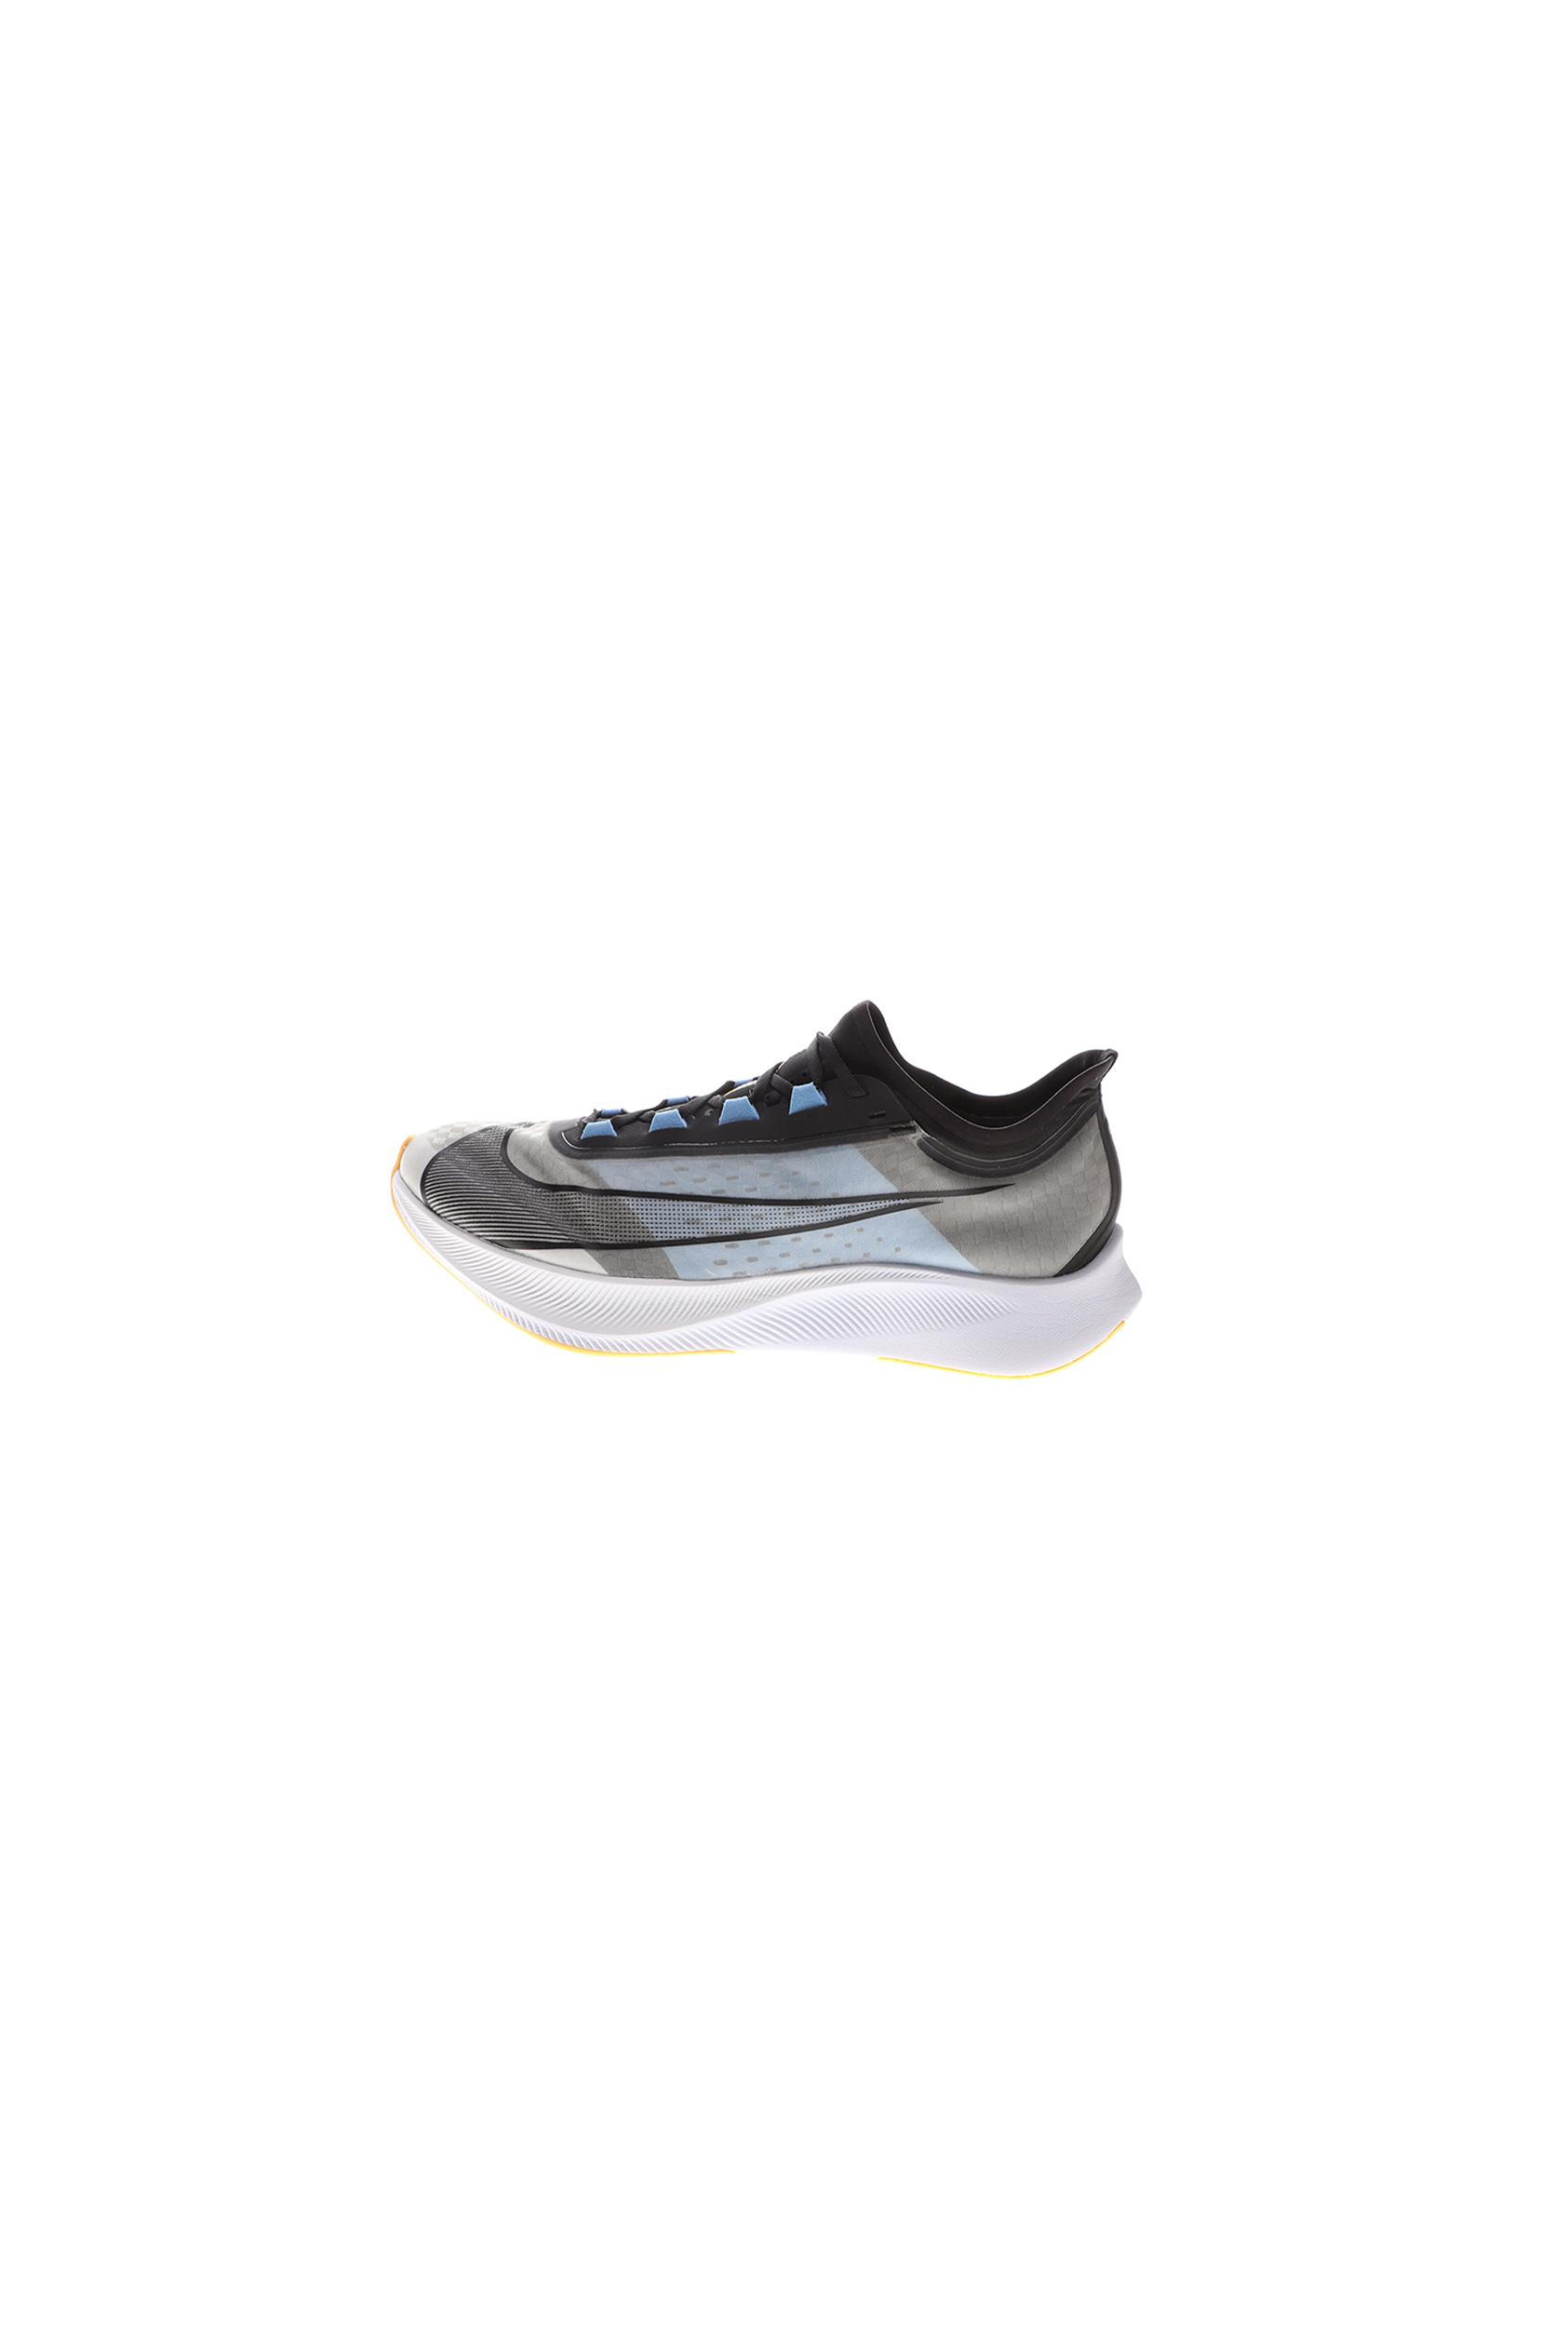 NIKE – Ανδρικά παπούτσια running ZOOM FLY 3 μπλε γκρι